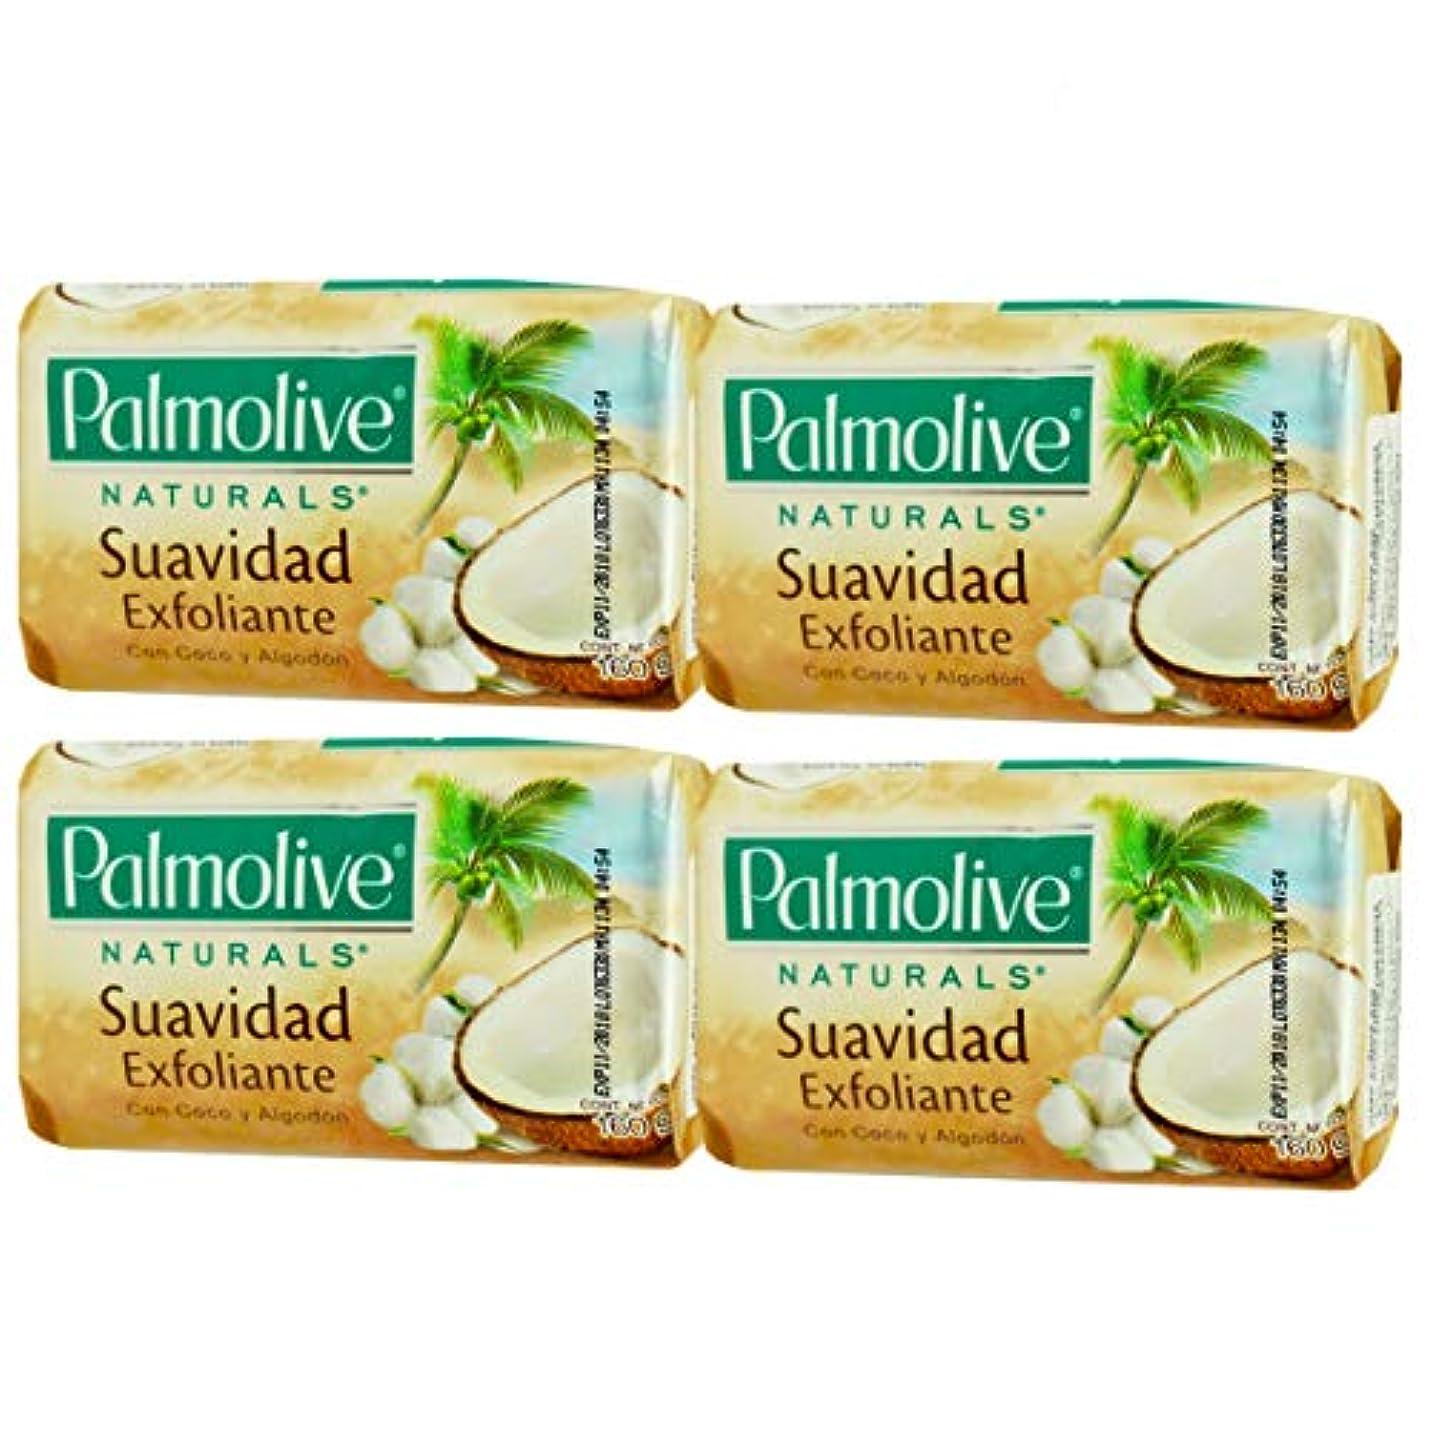 Palmolive ナチュラルズココY Algodonソープココナッツと綿160Gパック4